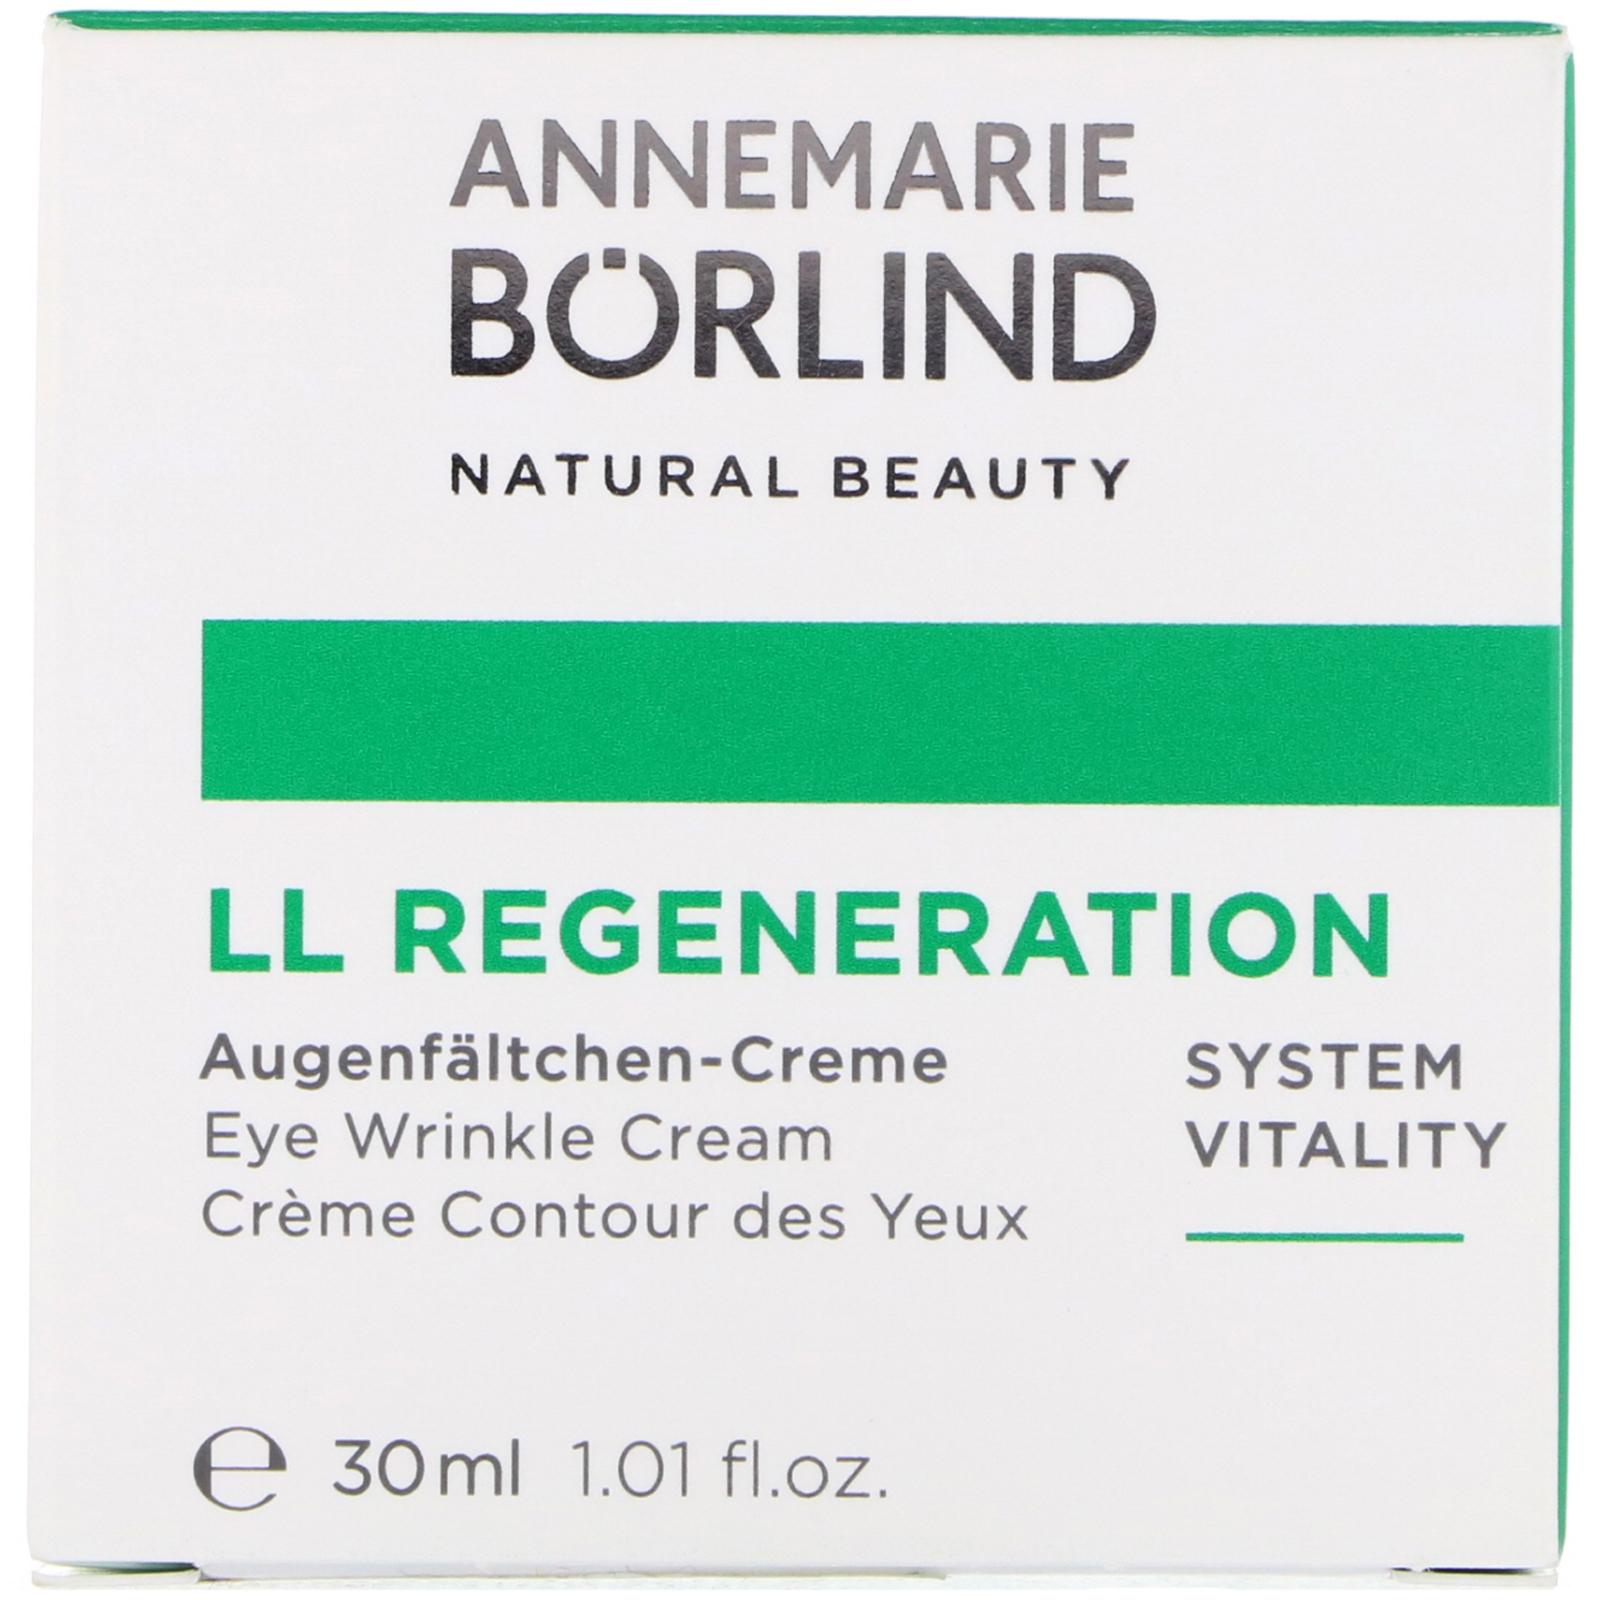 AnneMarie Borlind, LL Regeneration, Eye Wrinkle Cream, 1 01 fl oz